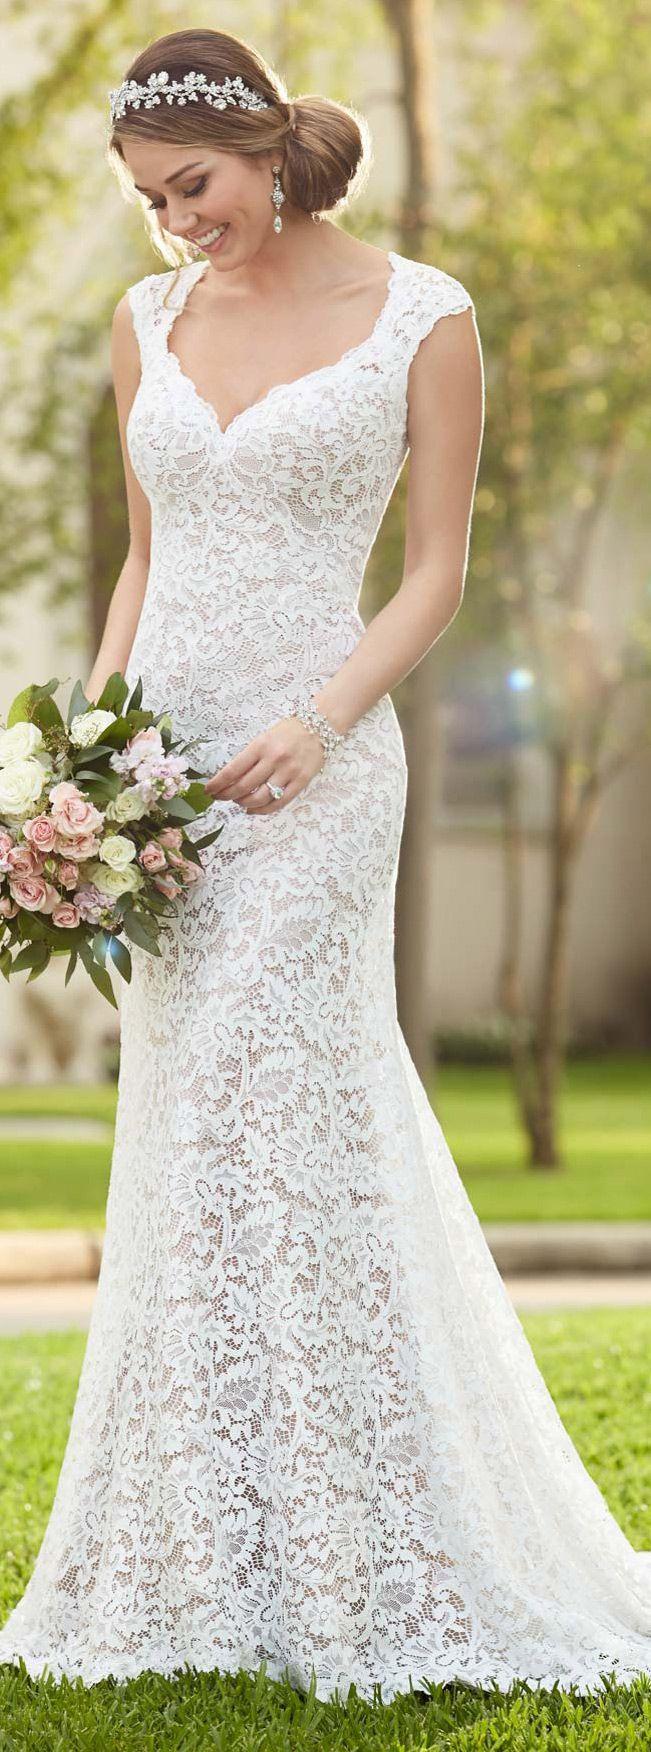 Lustre Satin Wedding Dress | Pinterest | Dress images, Continue ...